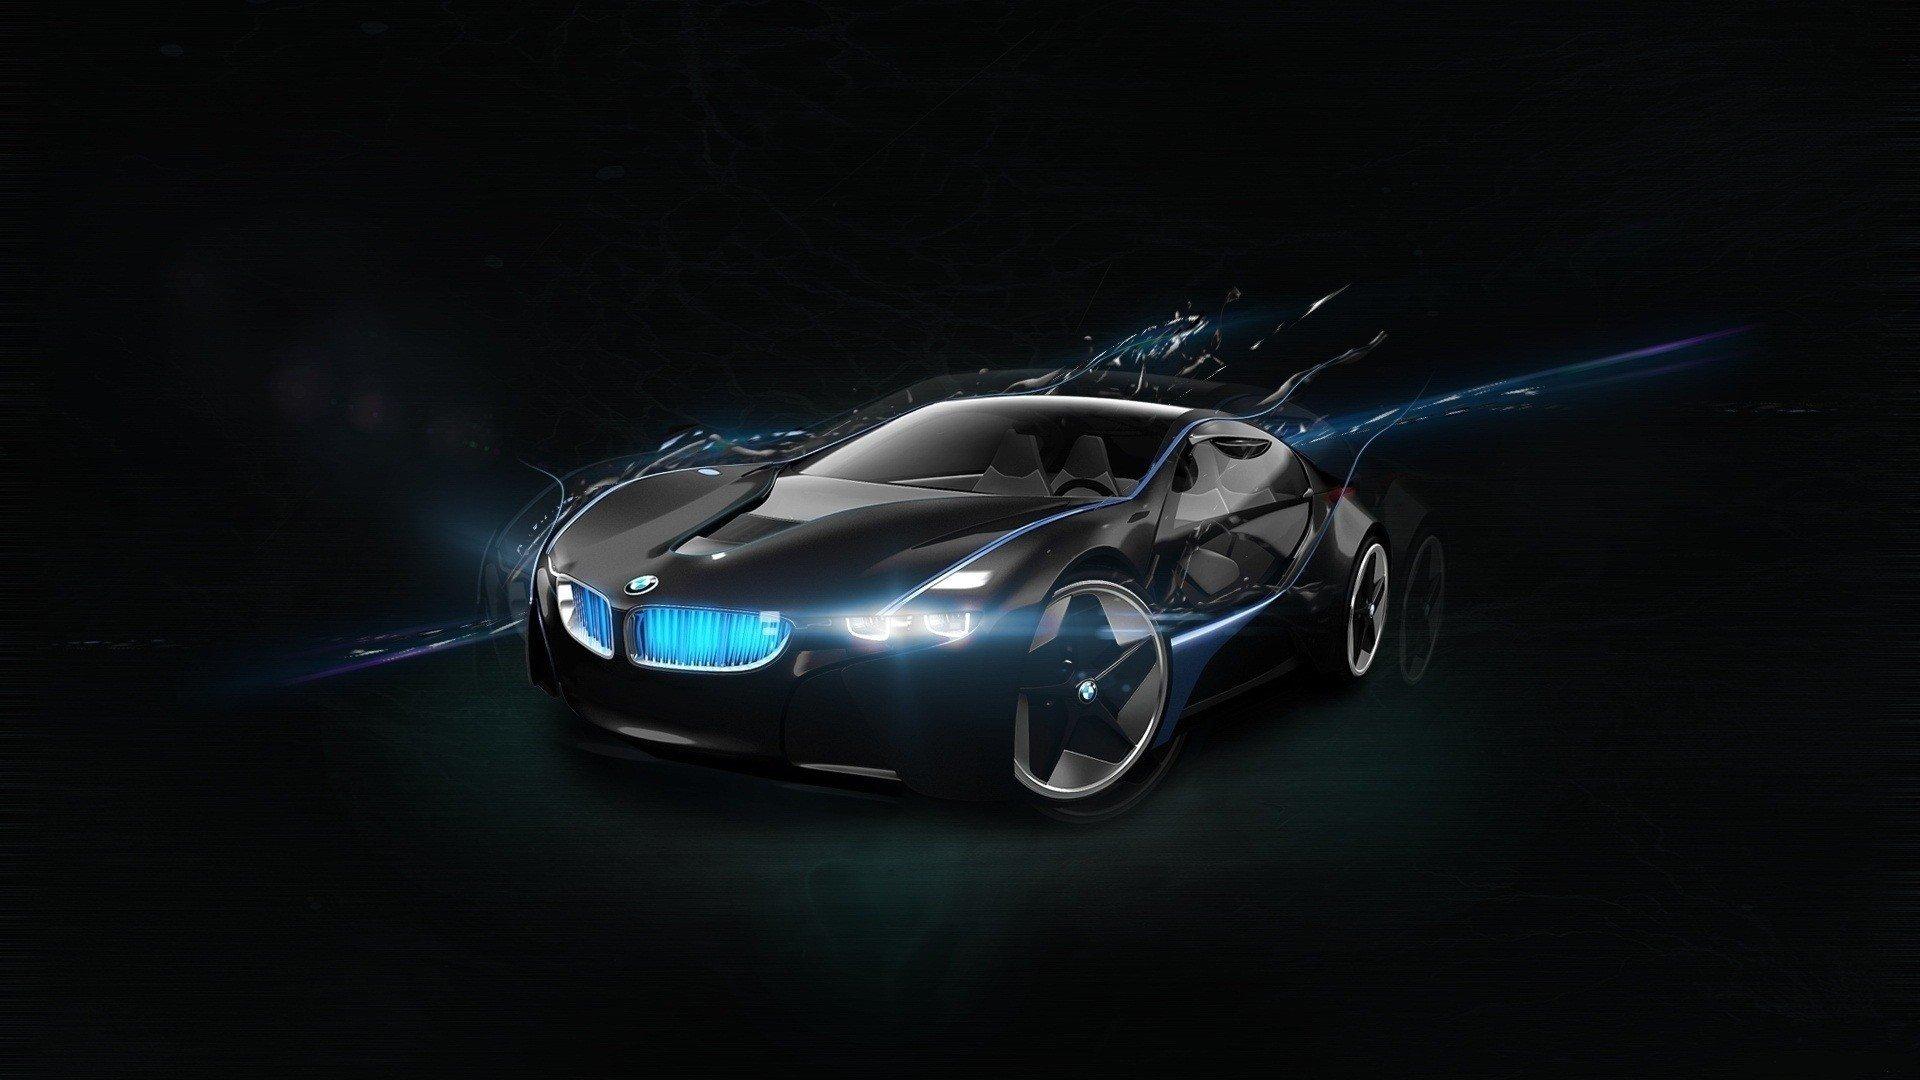 Fondos de pantalla BMW vision